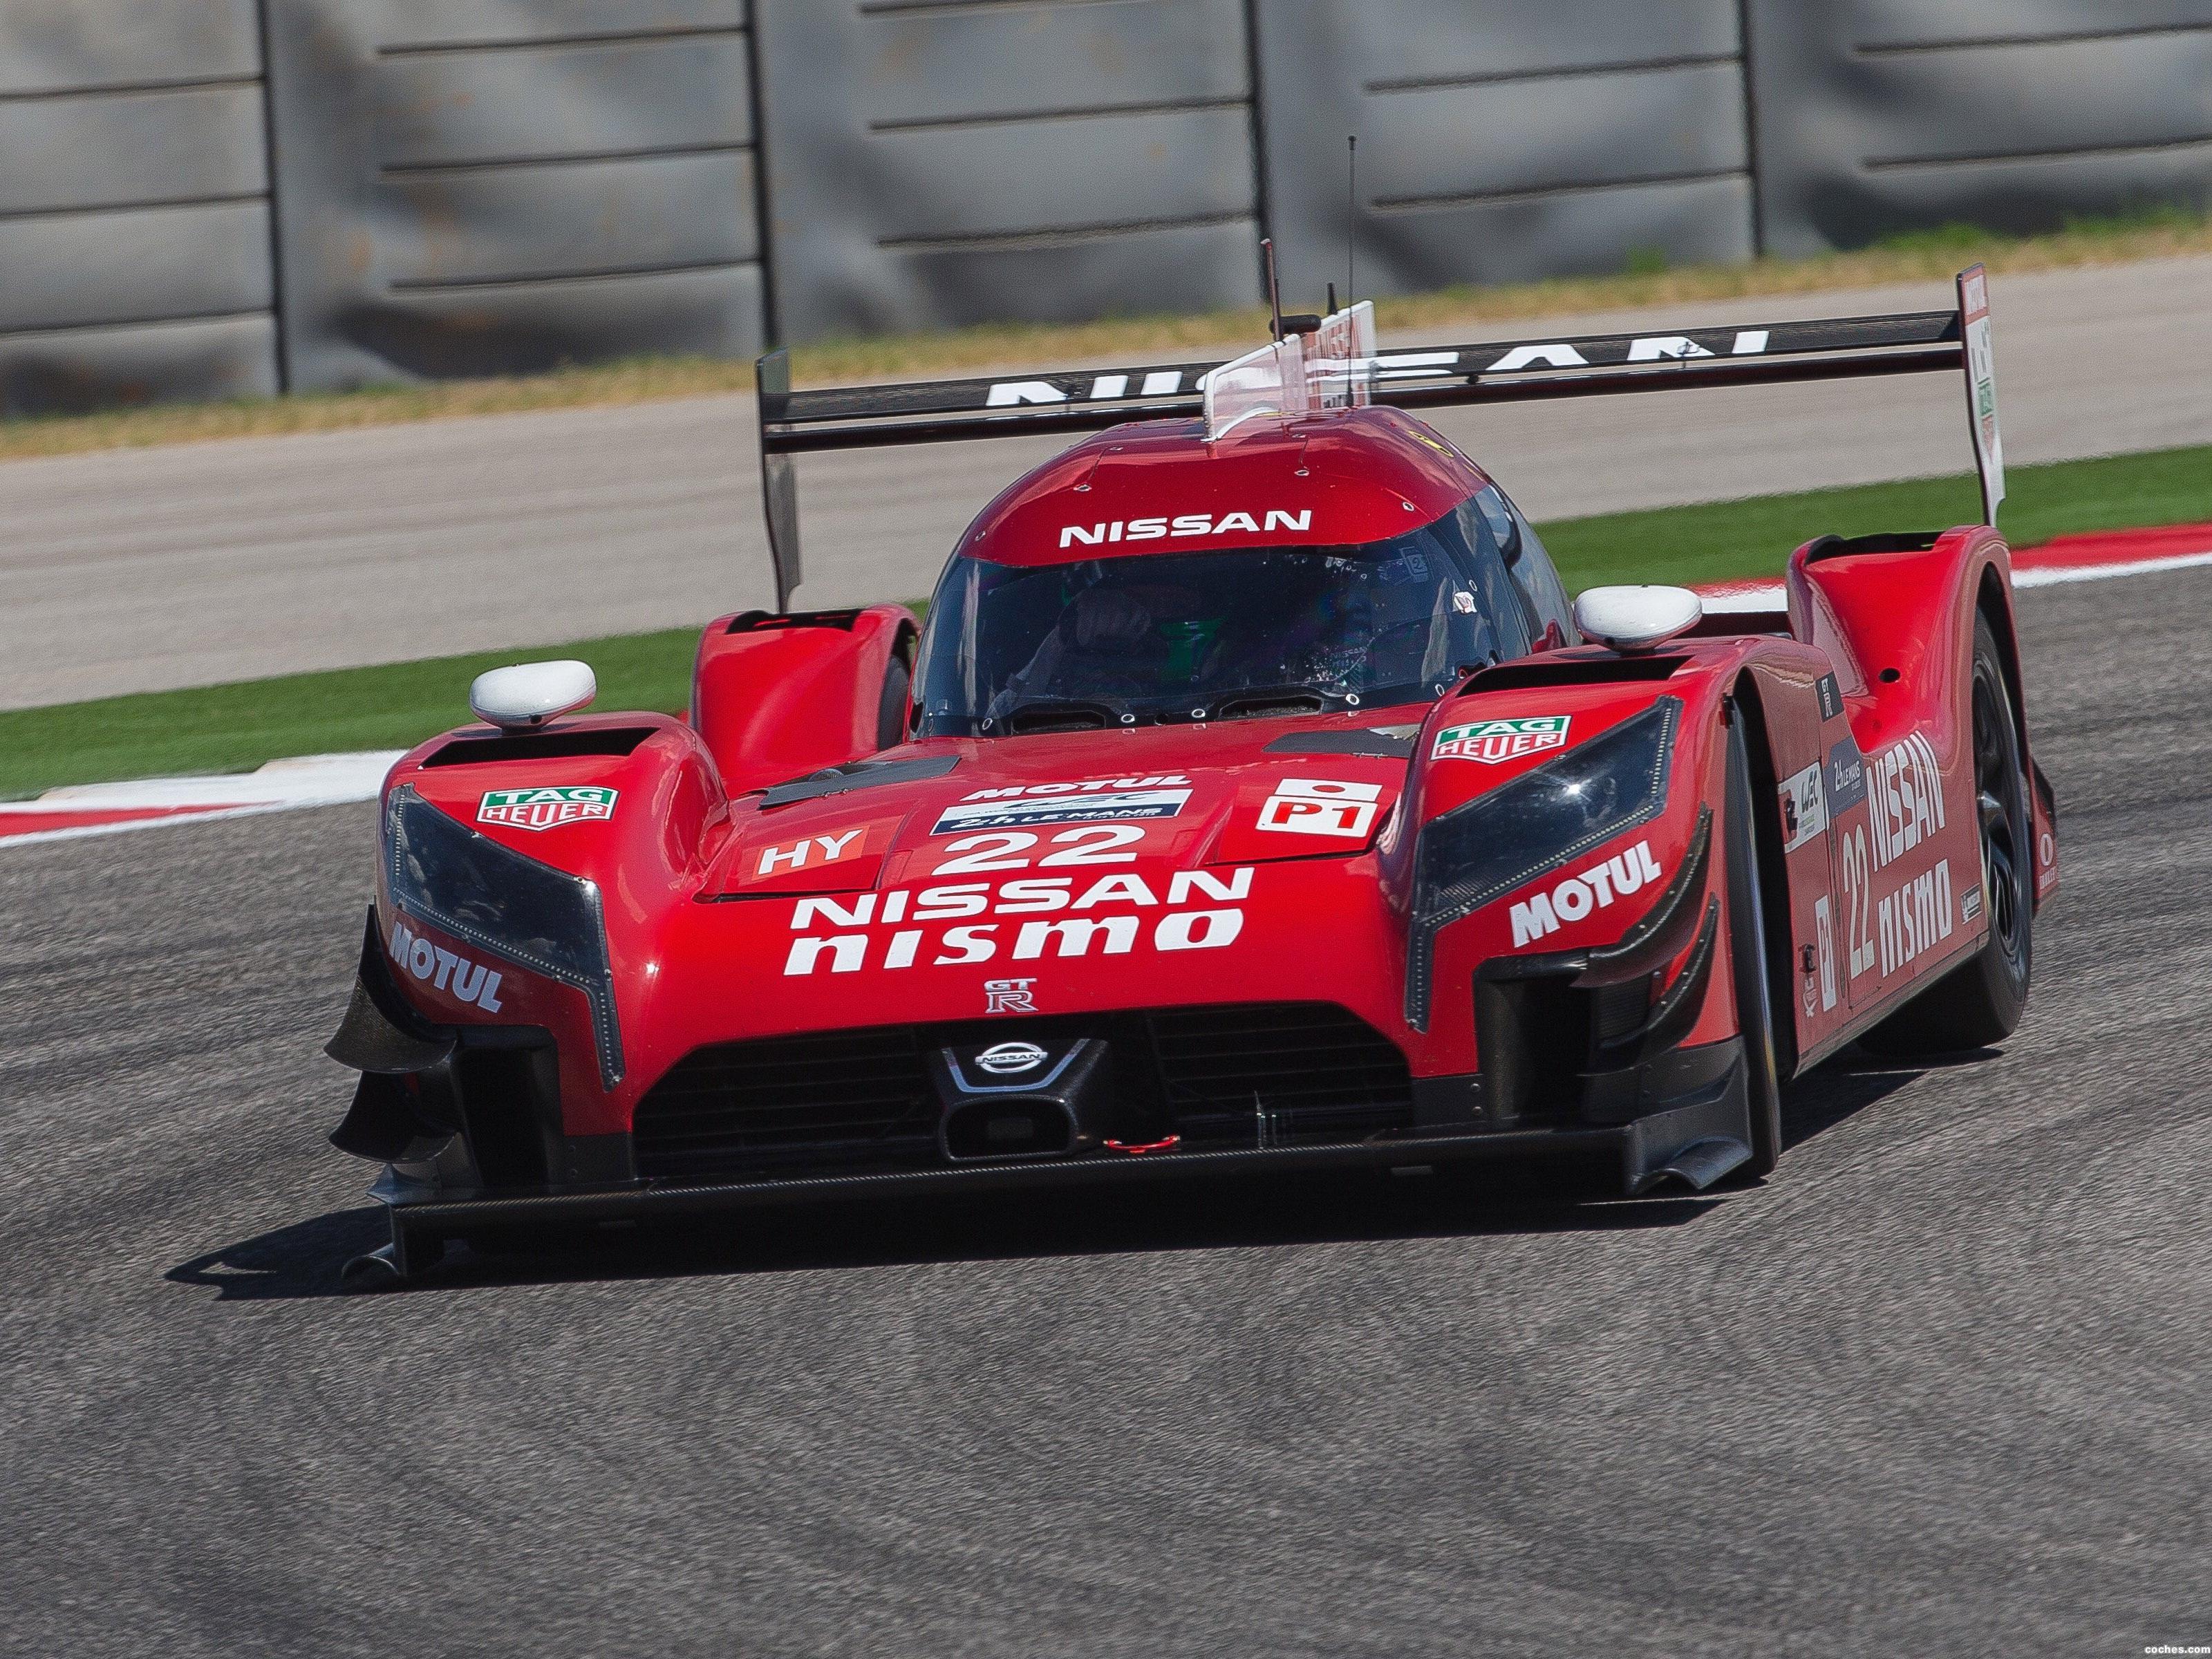 nismo_nissan-gt-r-lmp1-race-car-2016_r9.jpg